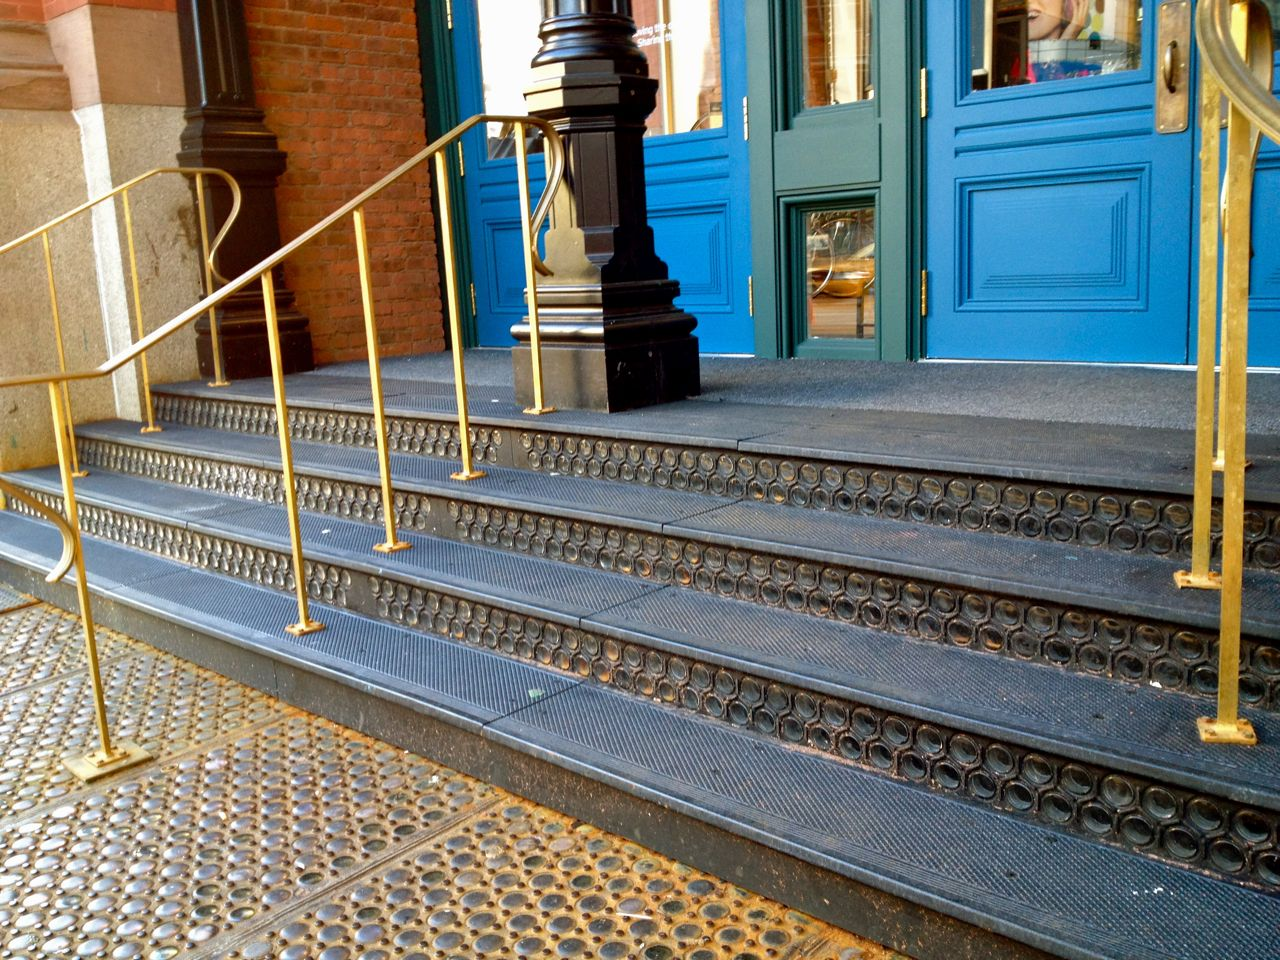 Cast iron stair treads, risers and landing panels, REI Manhattan.